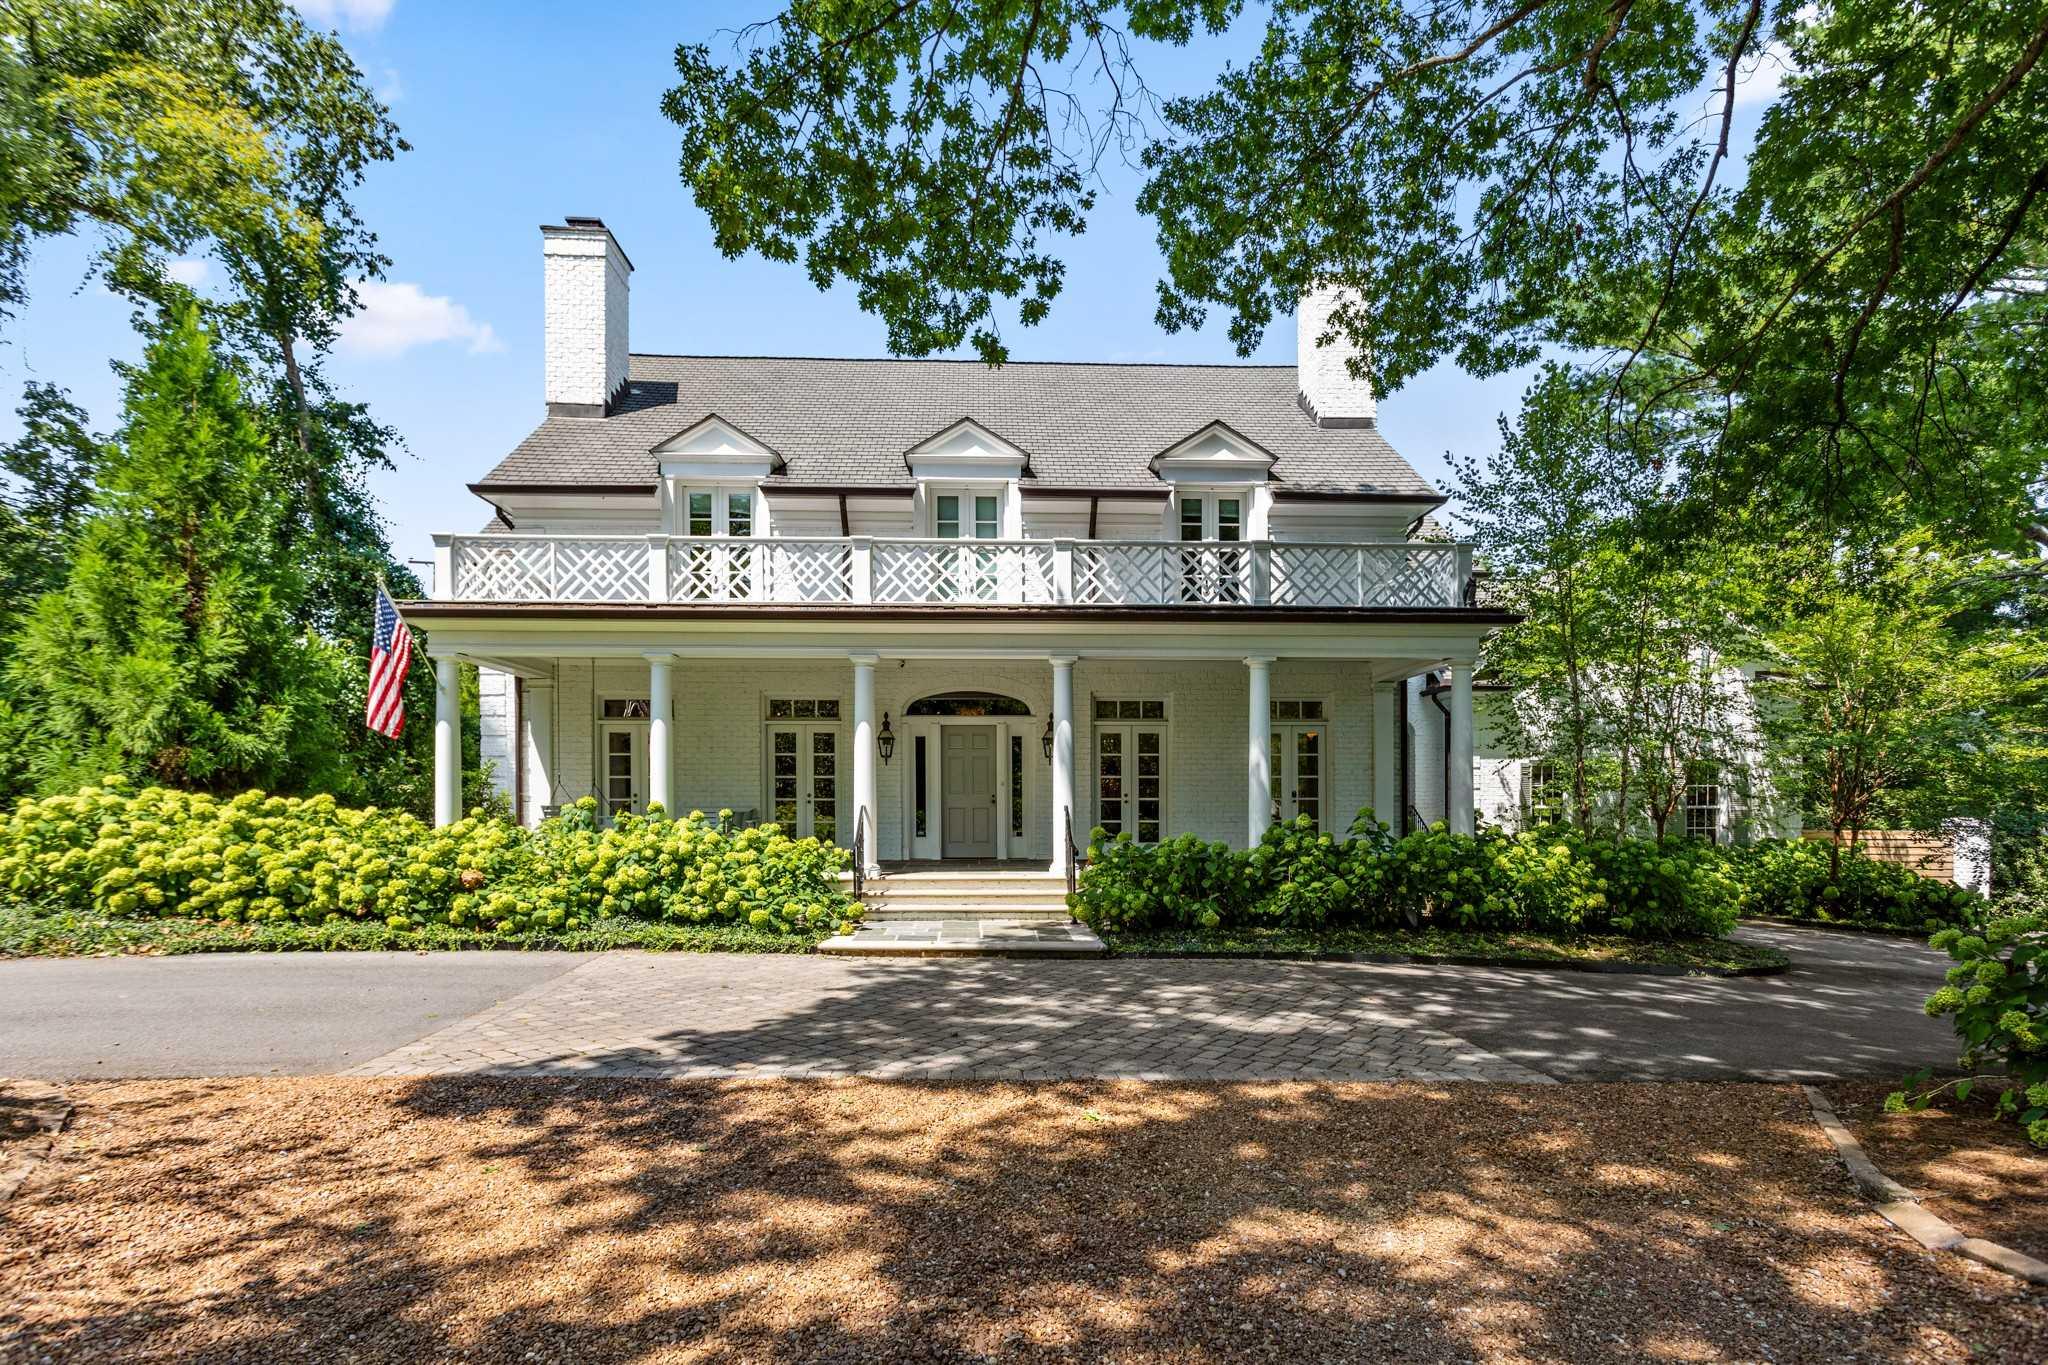 $4,150,000 - 5Br/9Ba -  for Sale in Golf Club/hampton, Nashville